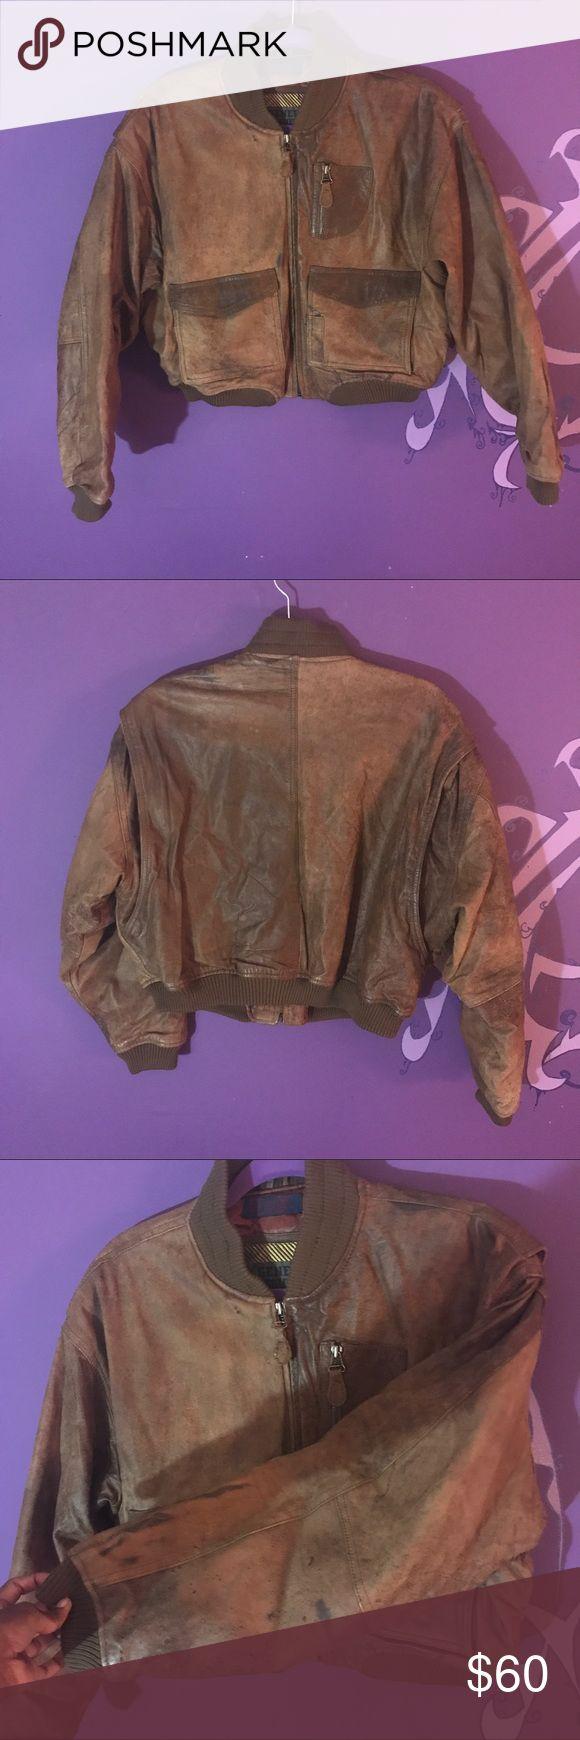 Men's brown leather jacket size medium authentic Men's Authentic brown leather jacket. Few stains along the arm but still a really sweet jacket. Size medium. LINK IN BIO!!! #leather #coat #jacket #brownleather #menswear #mensstyle #mensfashion #motorcycle #warm #real #generra #forsale #depop #poshmark #ebay #smallbusiness #blackowned #thrift generra Jackets & Coats Bomber & Varsity